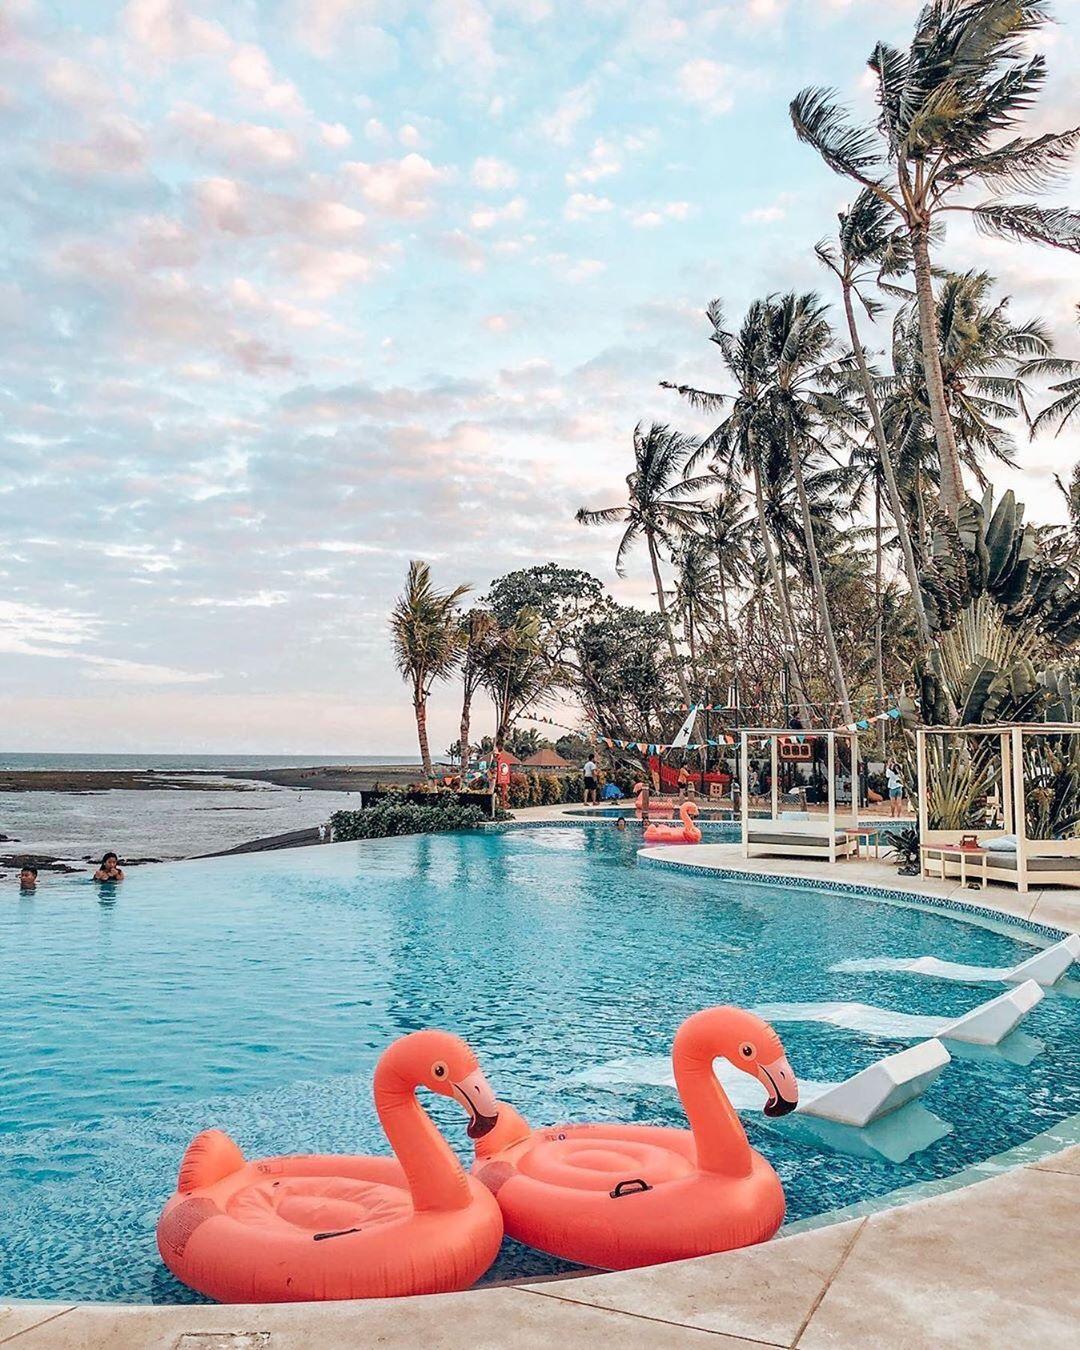 √8 Beach Club Terbaik Di Bali Yang Pas Buat Nongkrong Saat